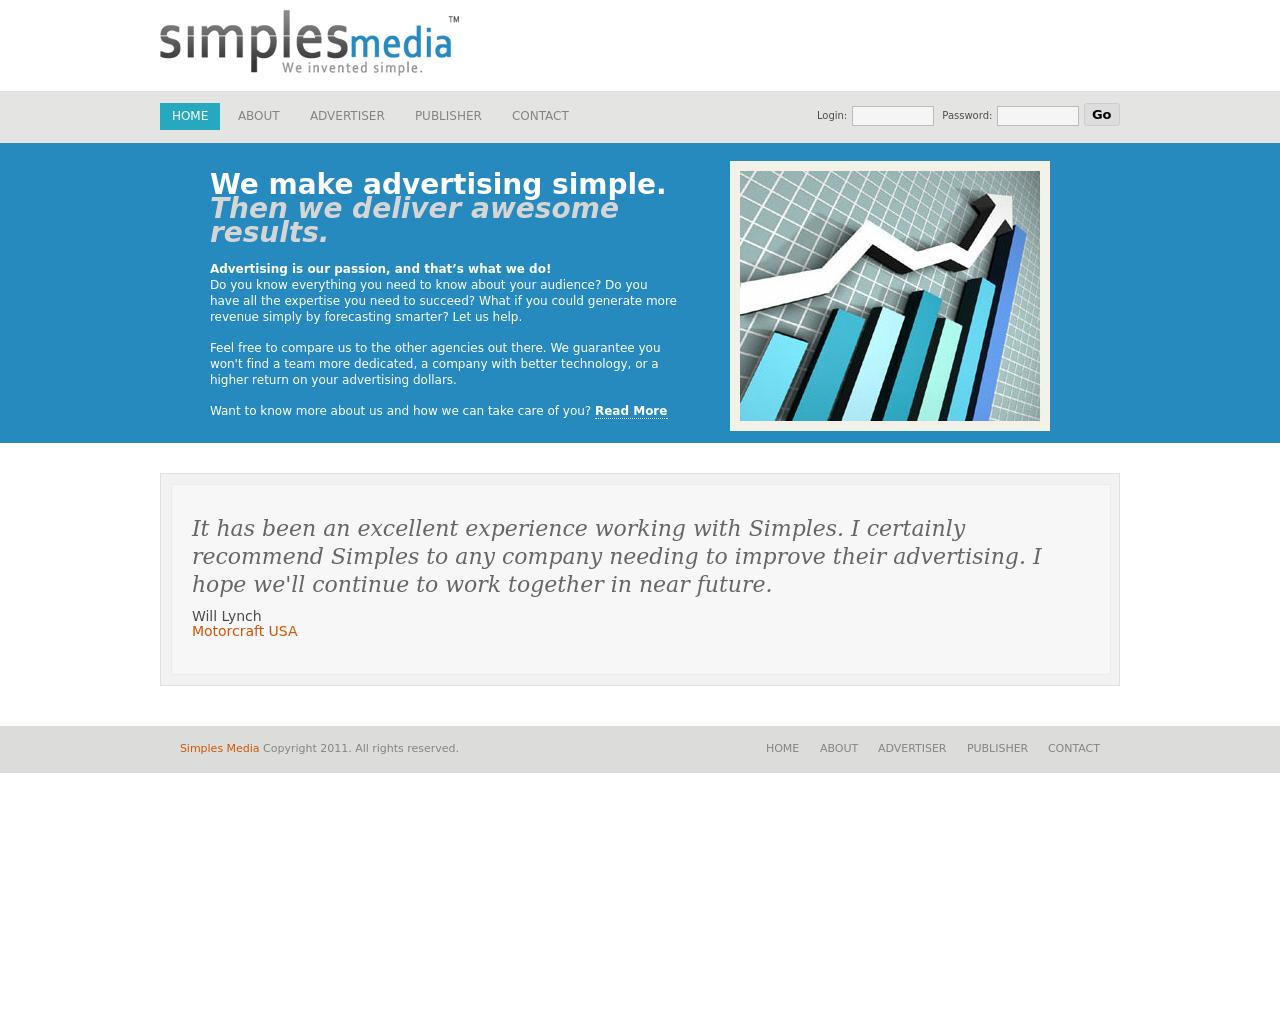 Simples-Media-Advertising-Reviews-Pricing